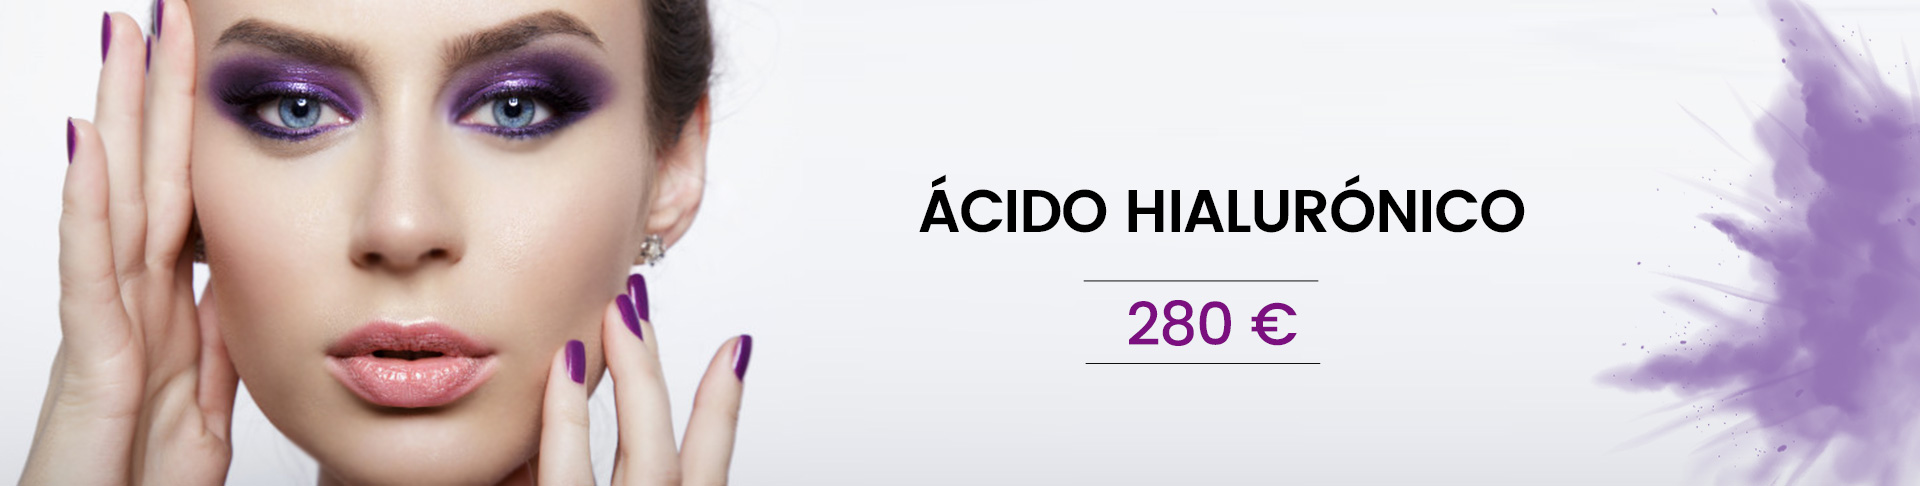 BANNER_ACIDO-HIALURONICO2